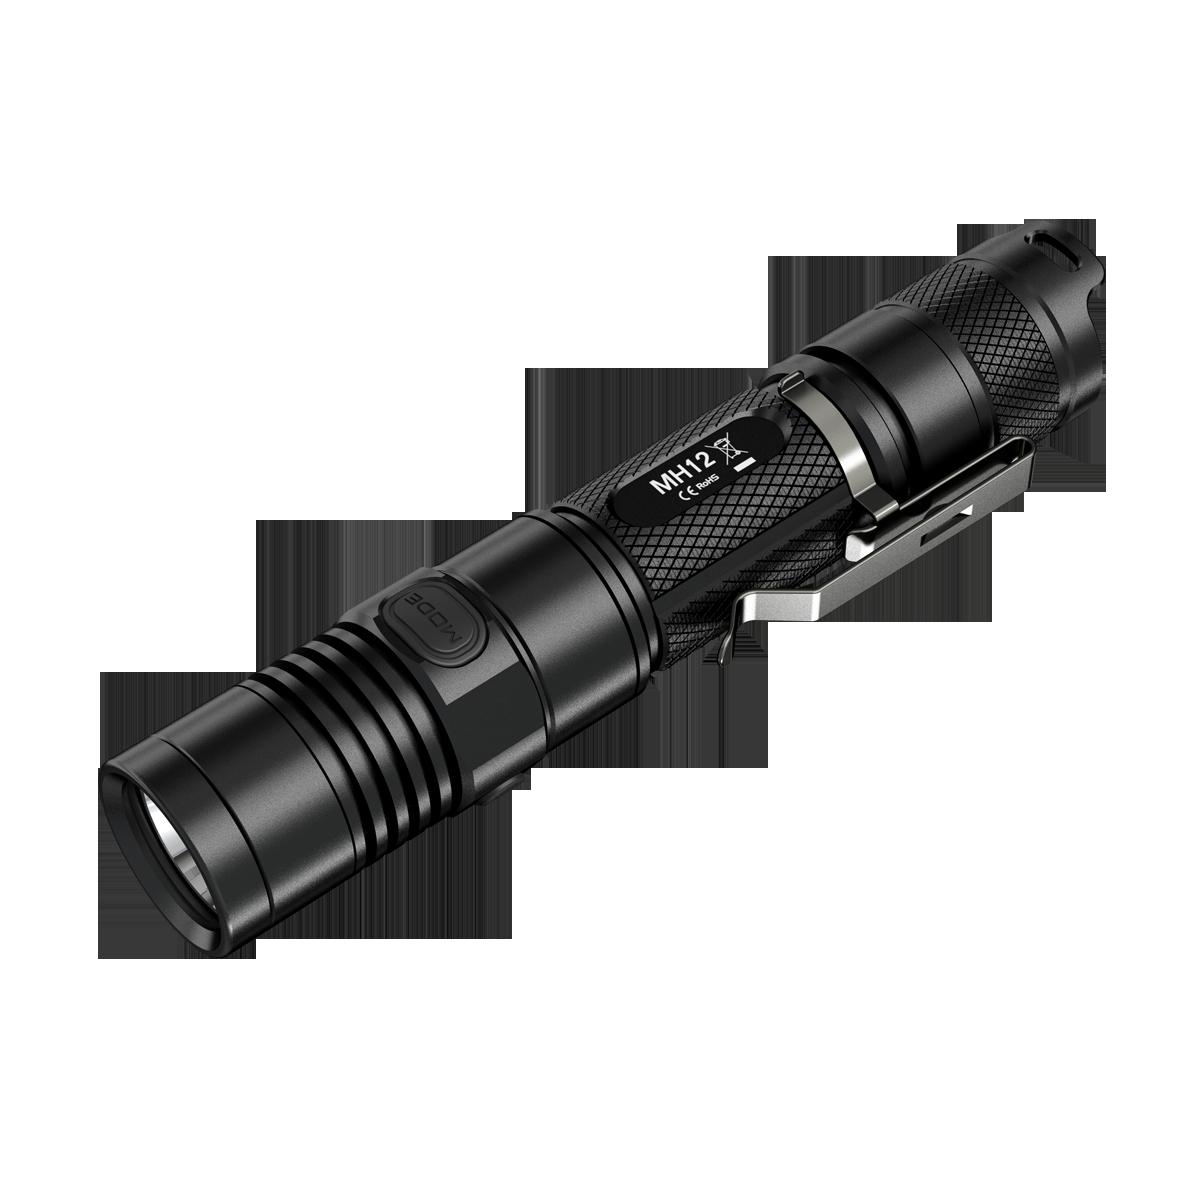 Nitecore mh10/mh12: micro usb, xm-l2(u2) led, max. 1000 lumens.